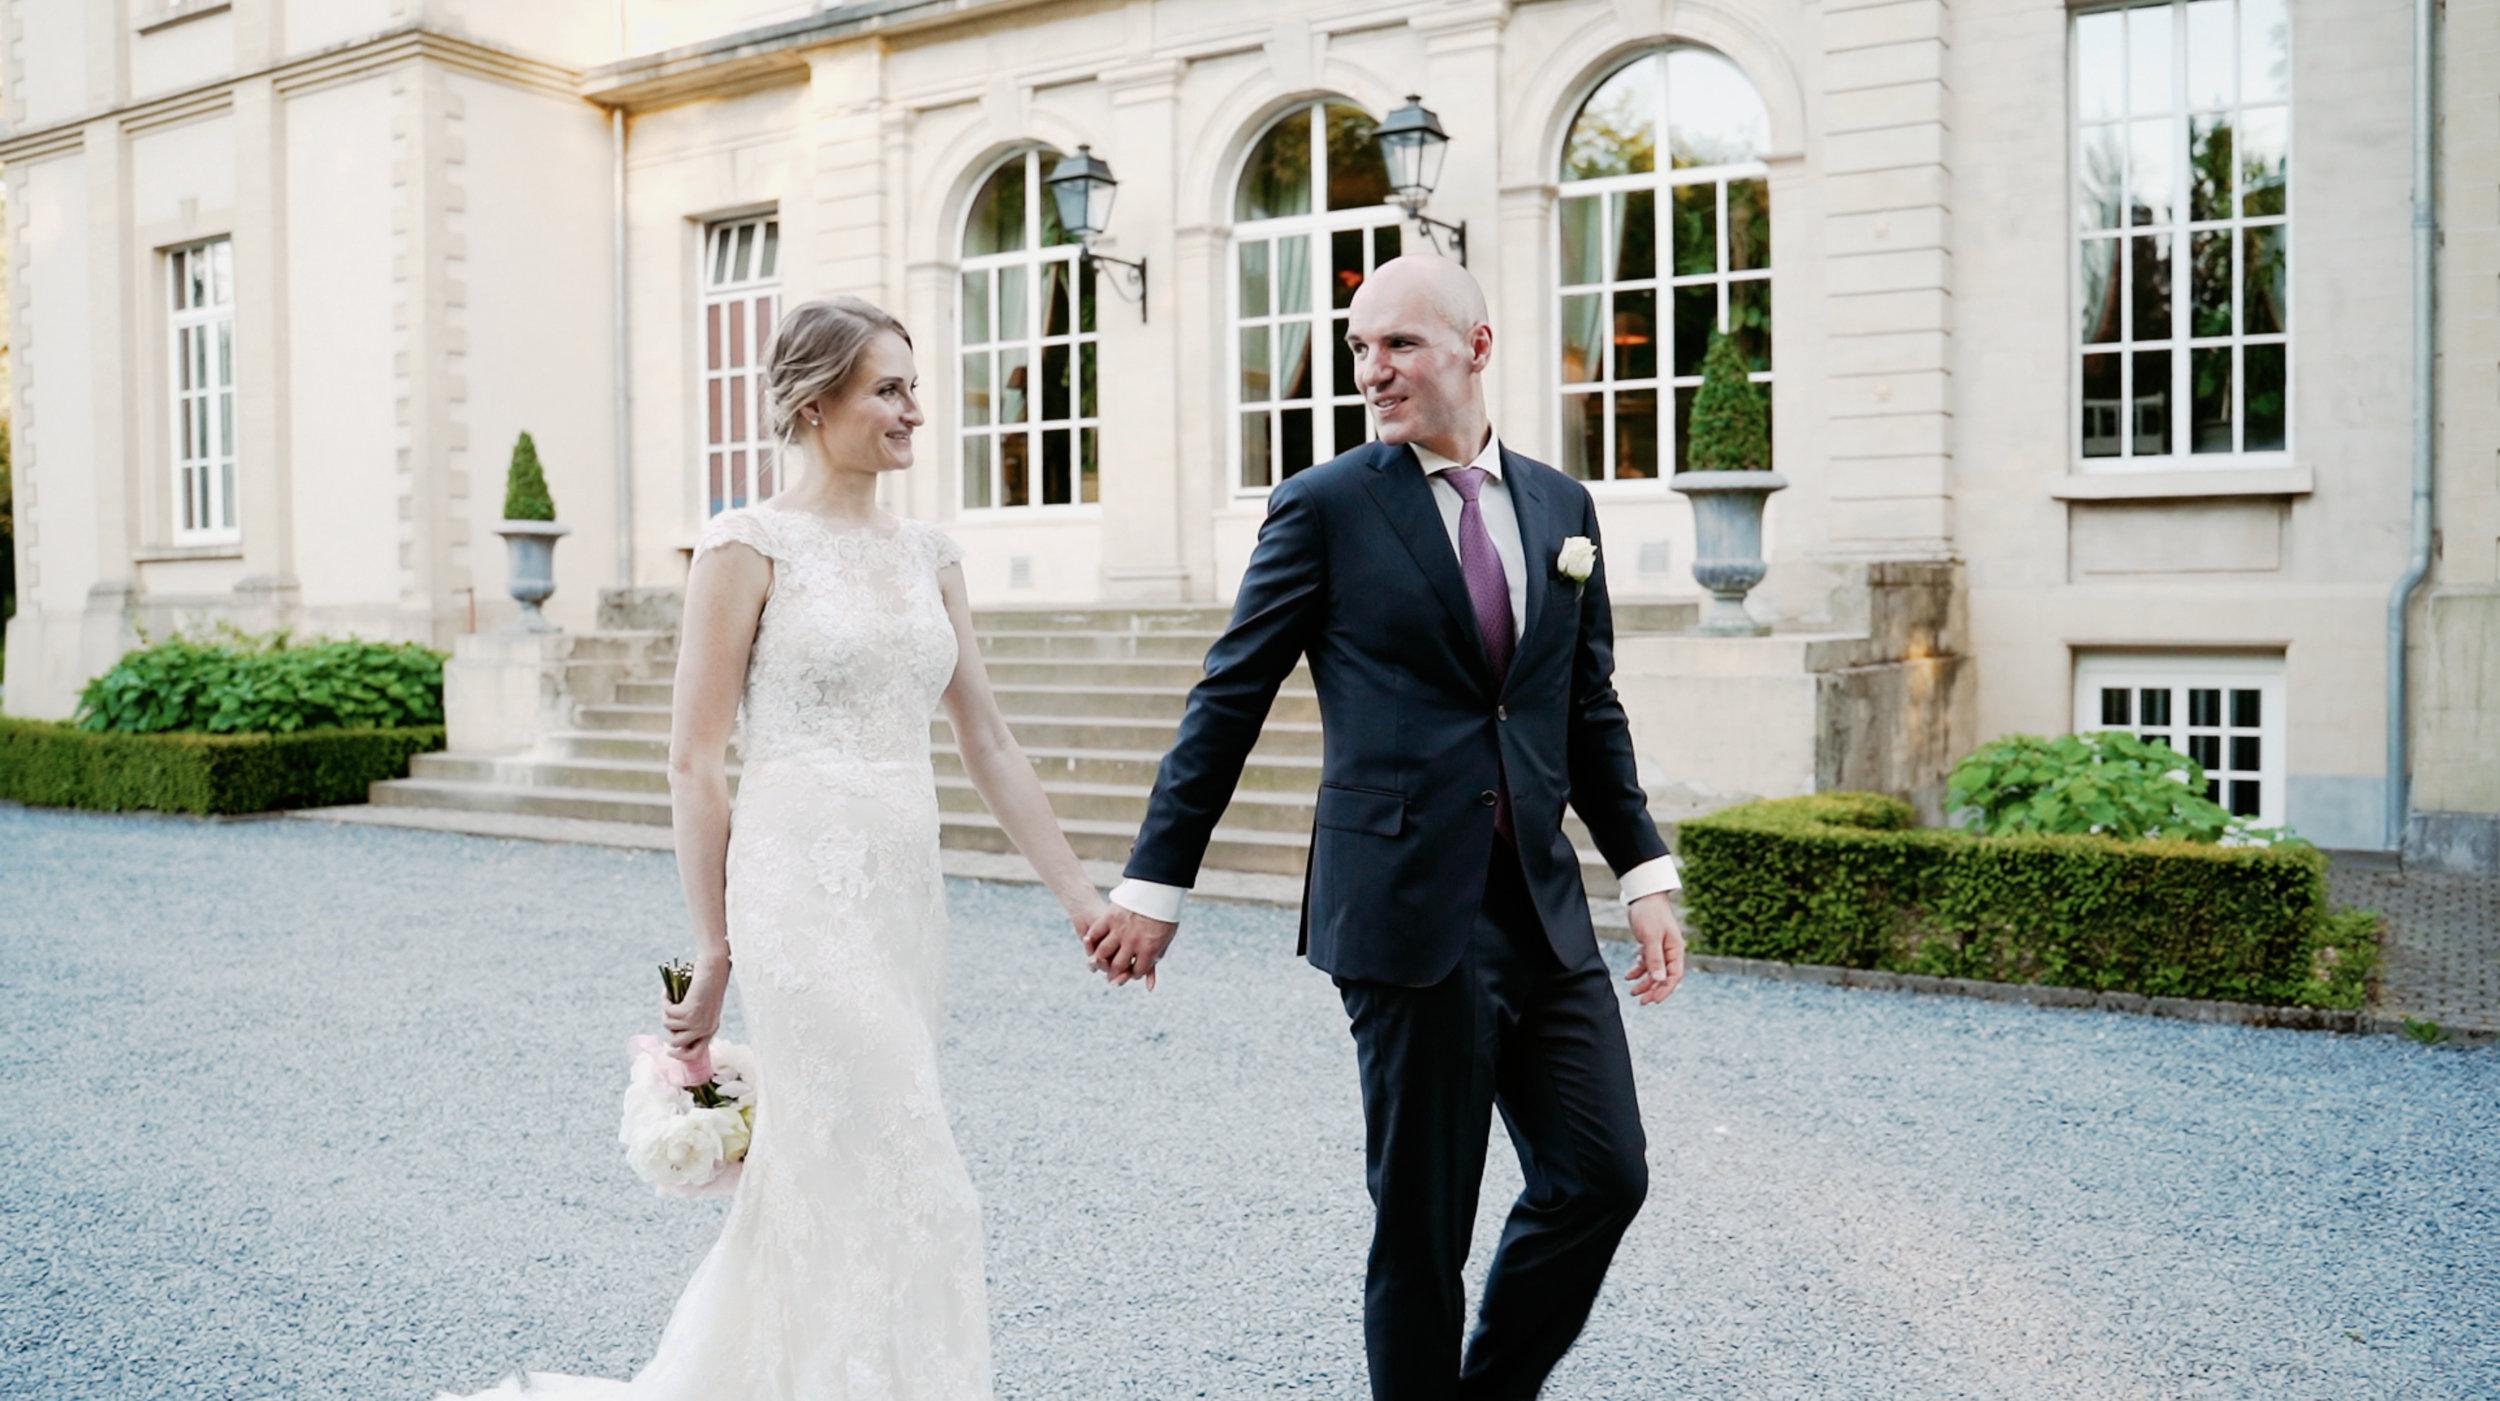 photographe-bruxelles-mariage-nicolasleleu5.jpg